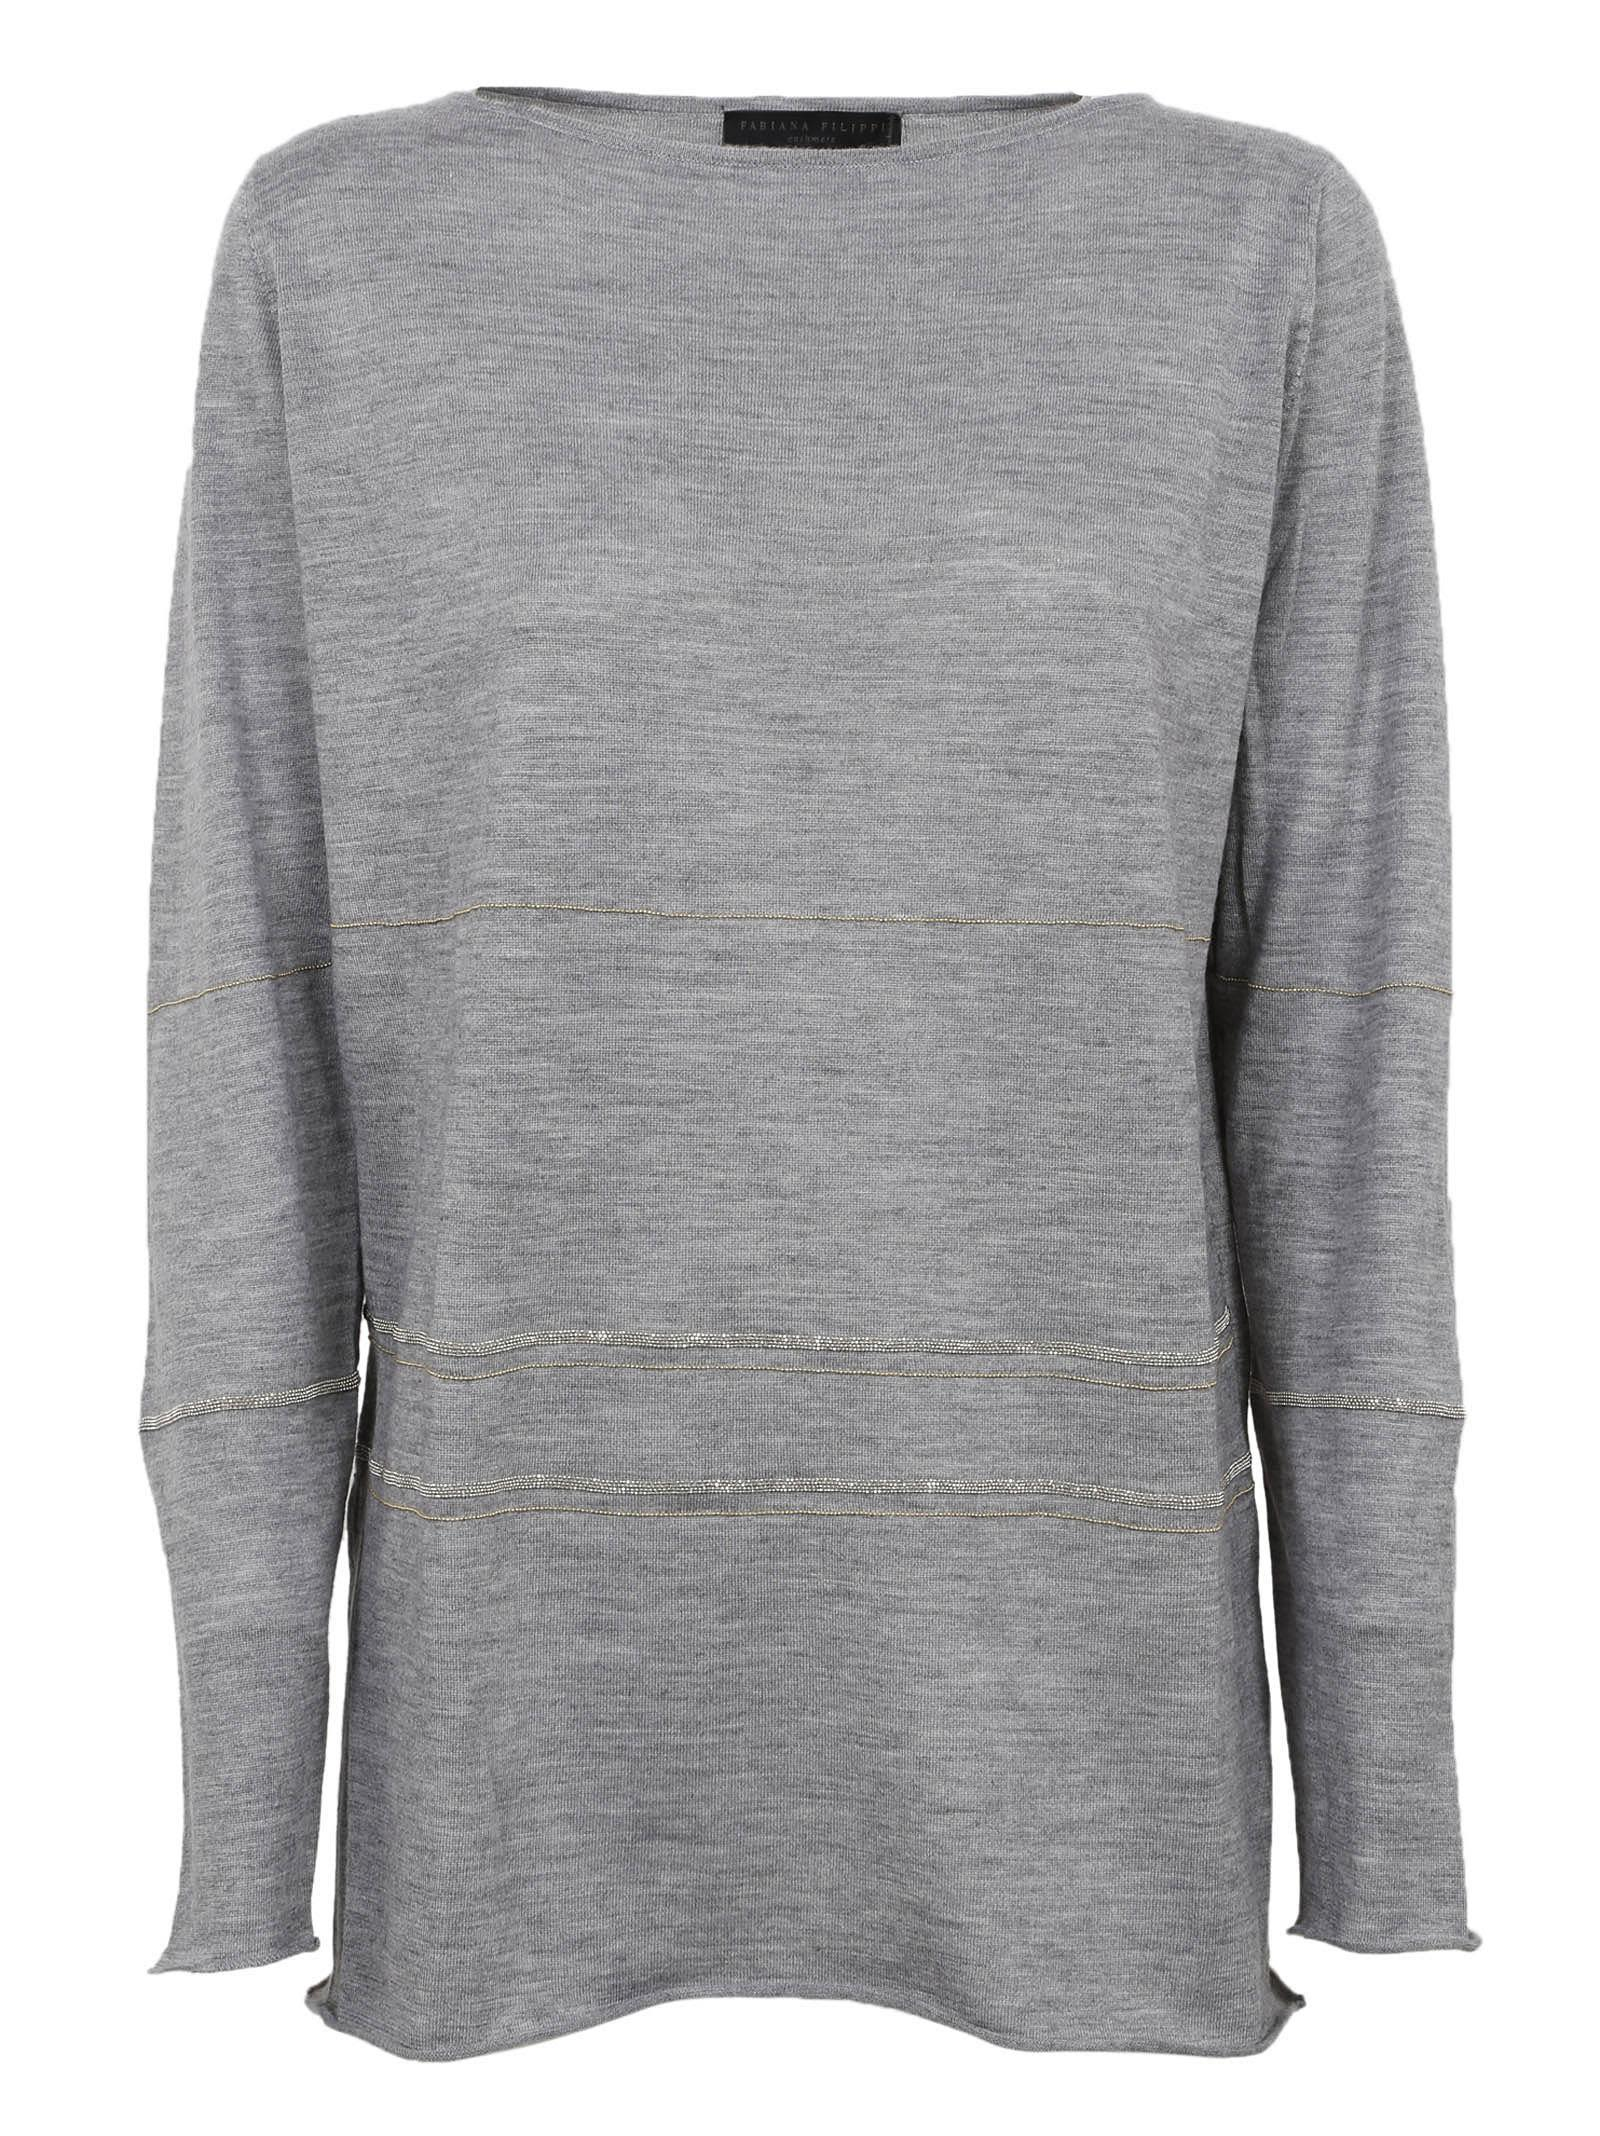 Fabiana Filippi Metallic Stiped Sweater